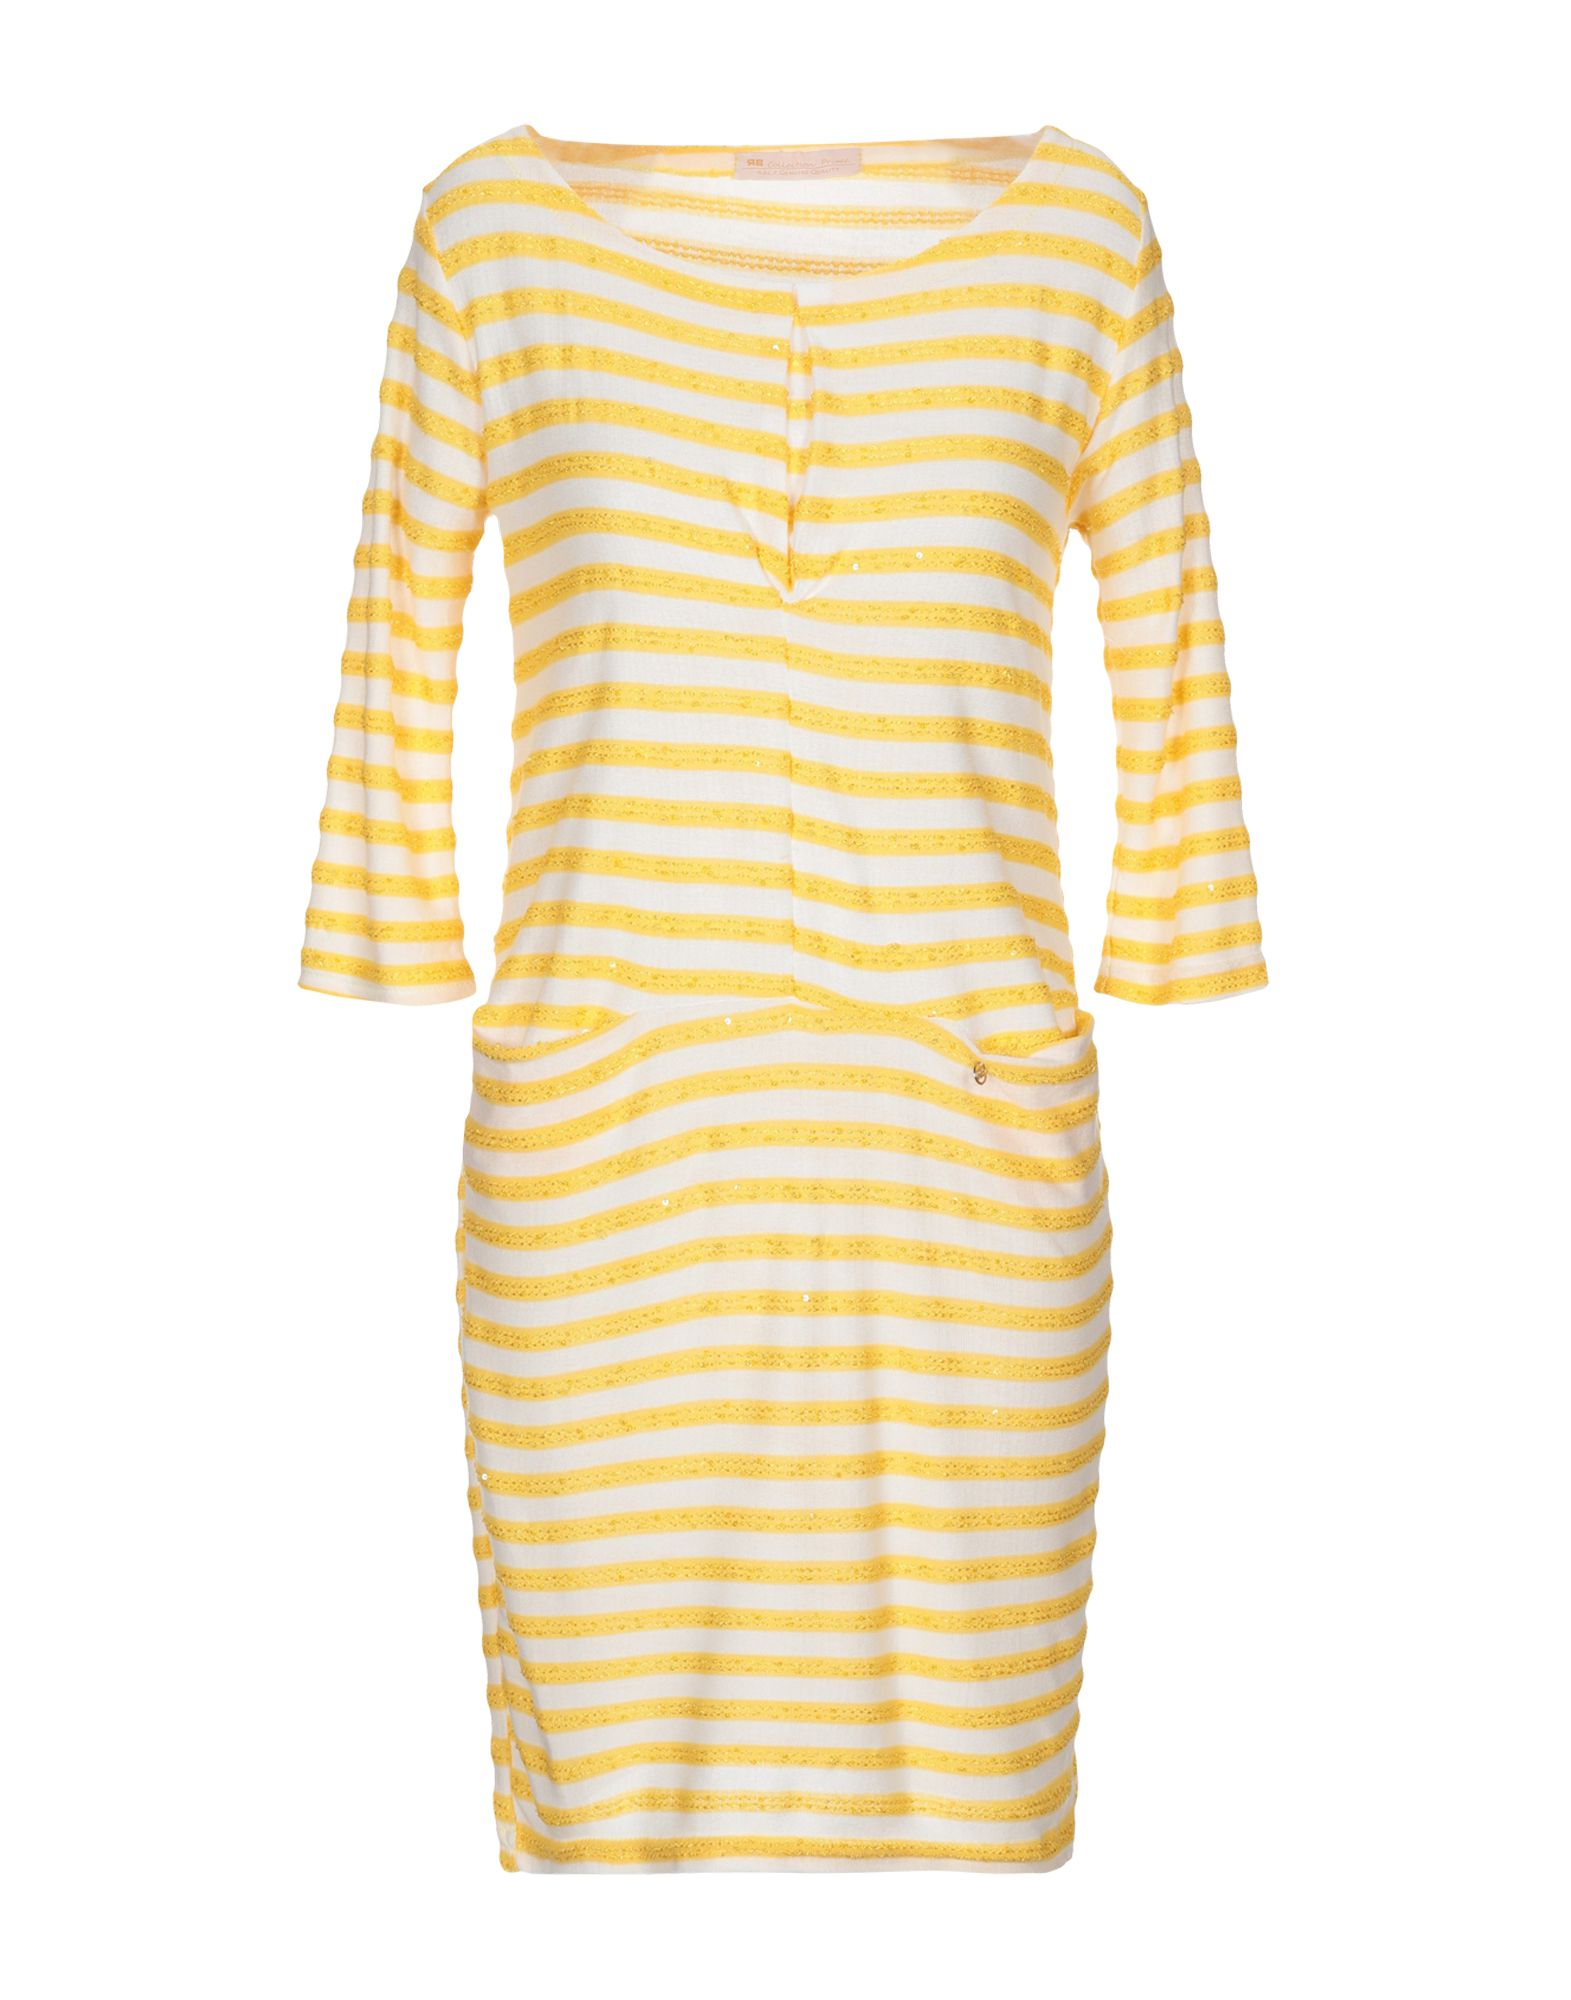 RB COLLECTION PRIVÉ Короткое платье